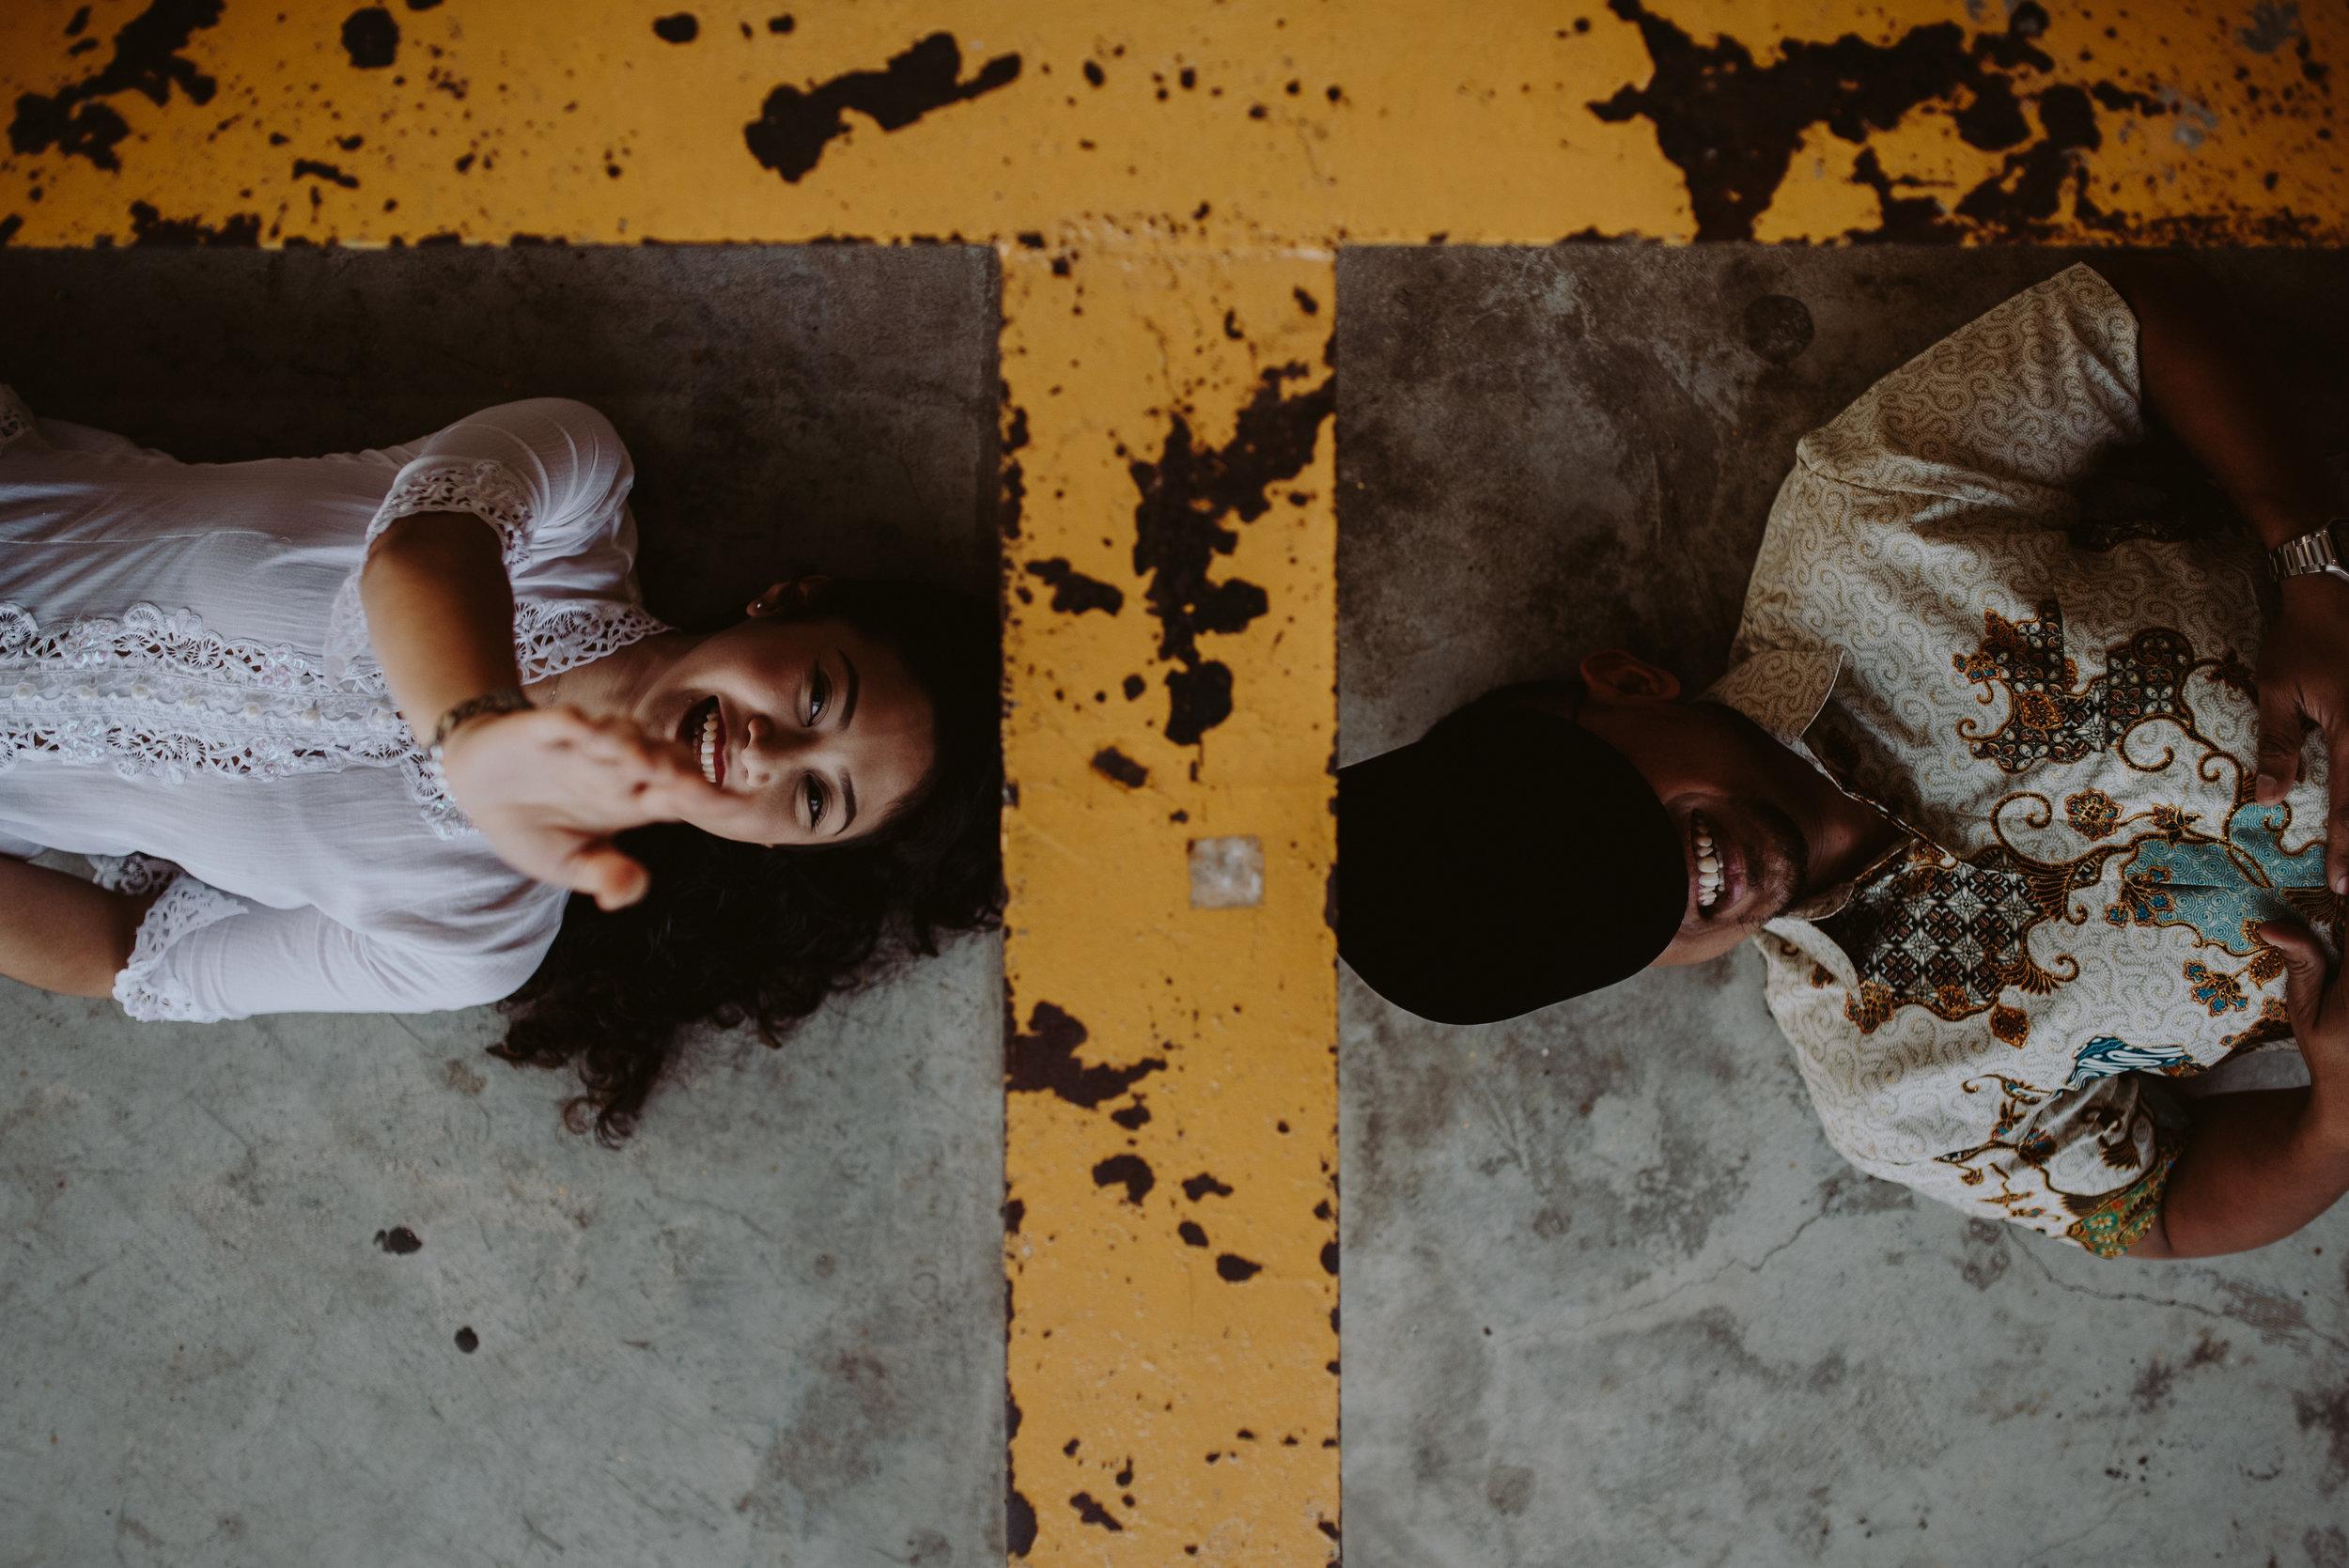 Singapore Wedding Photography | The Vanilla Project | Best of the Best Wedding Photography | Junebug Weddings